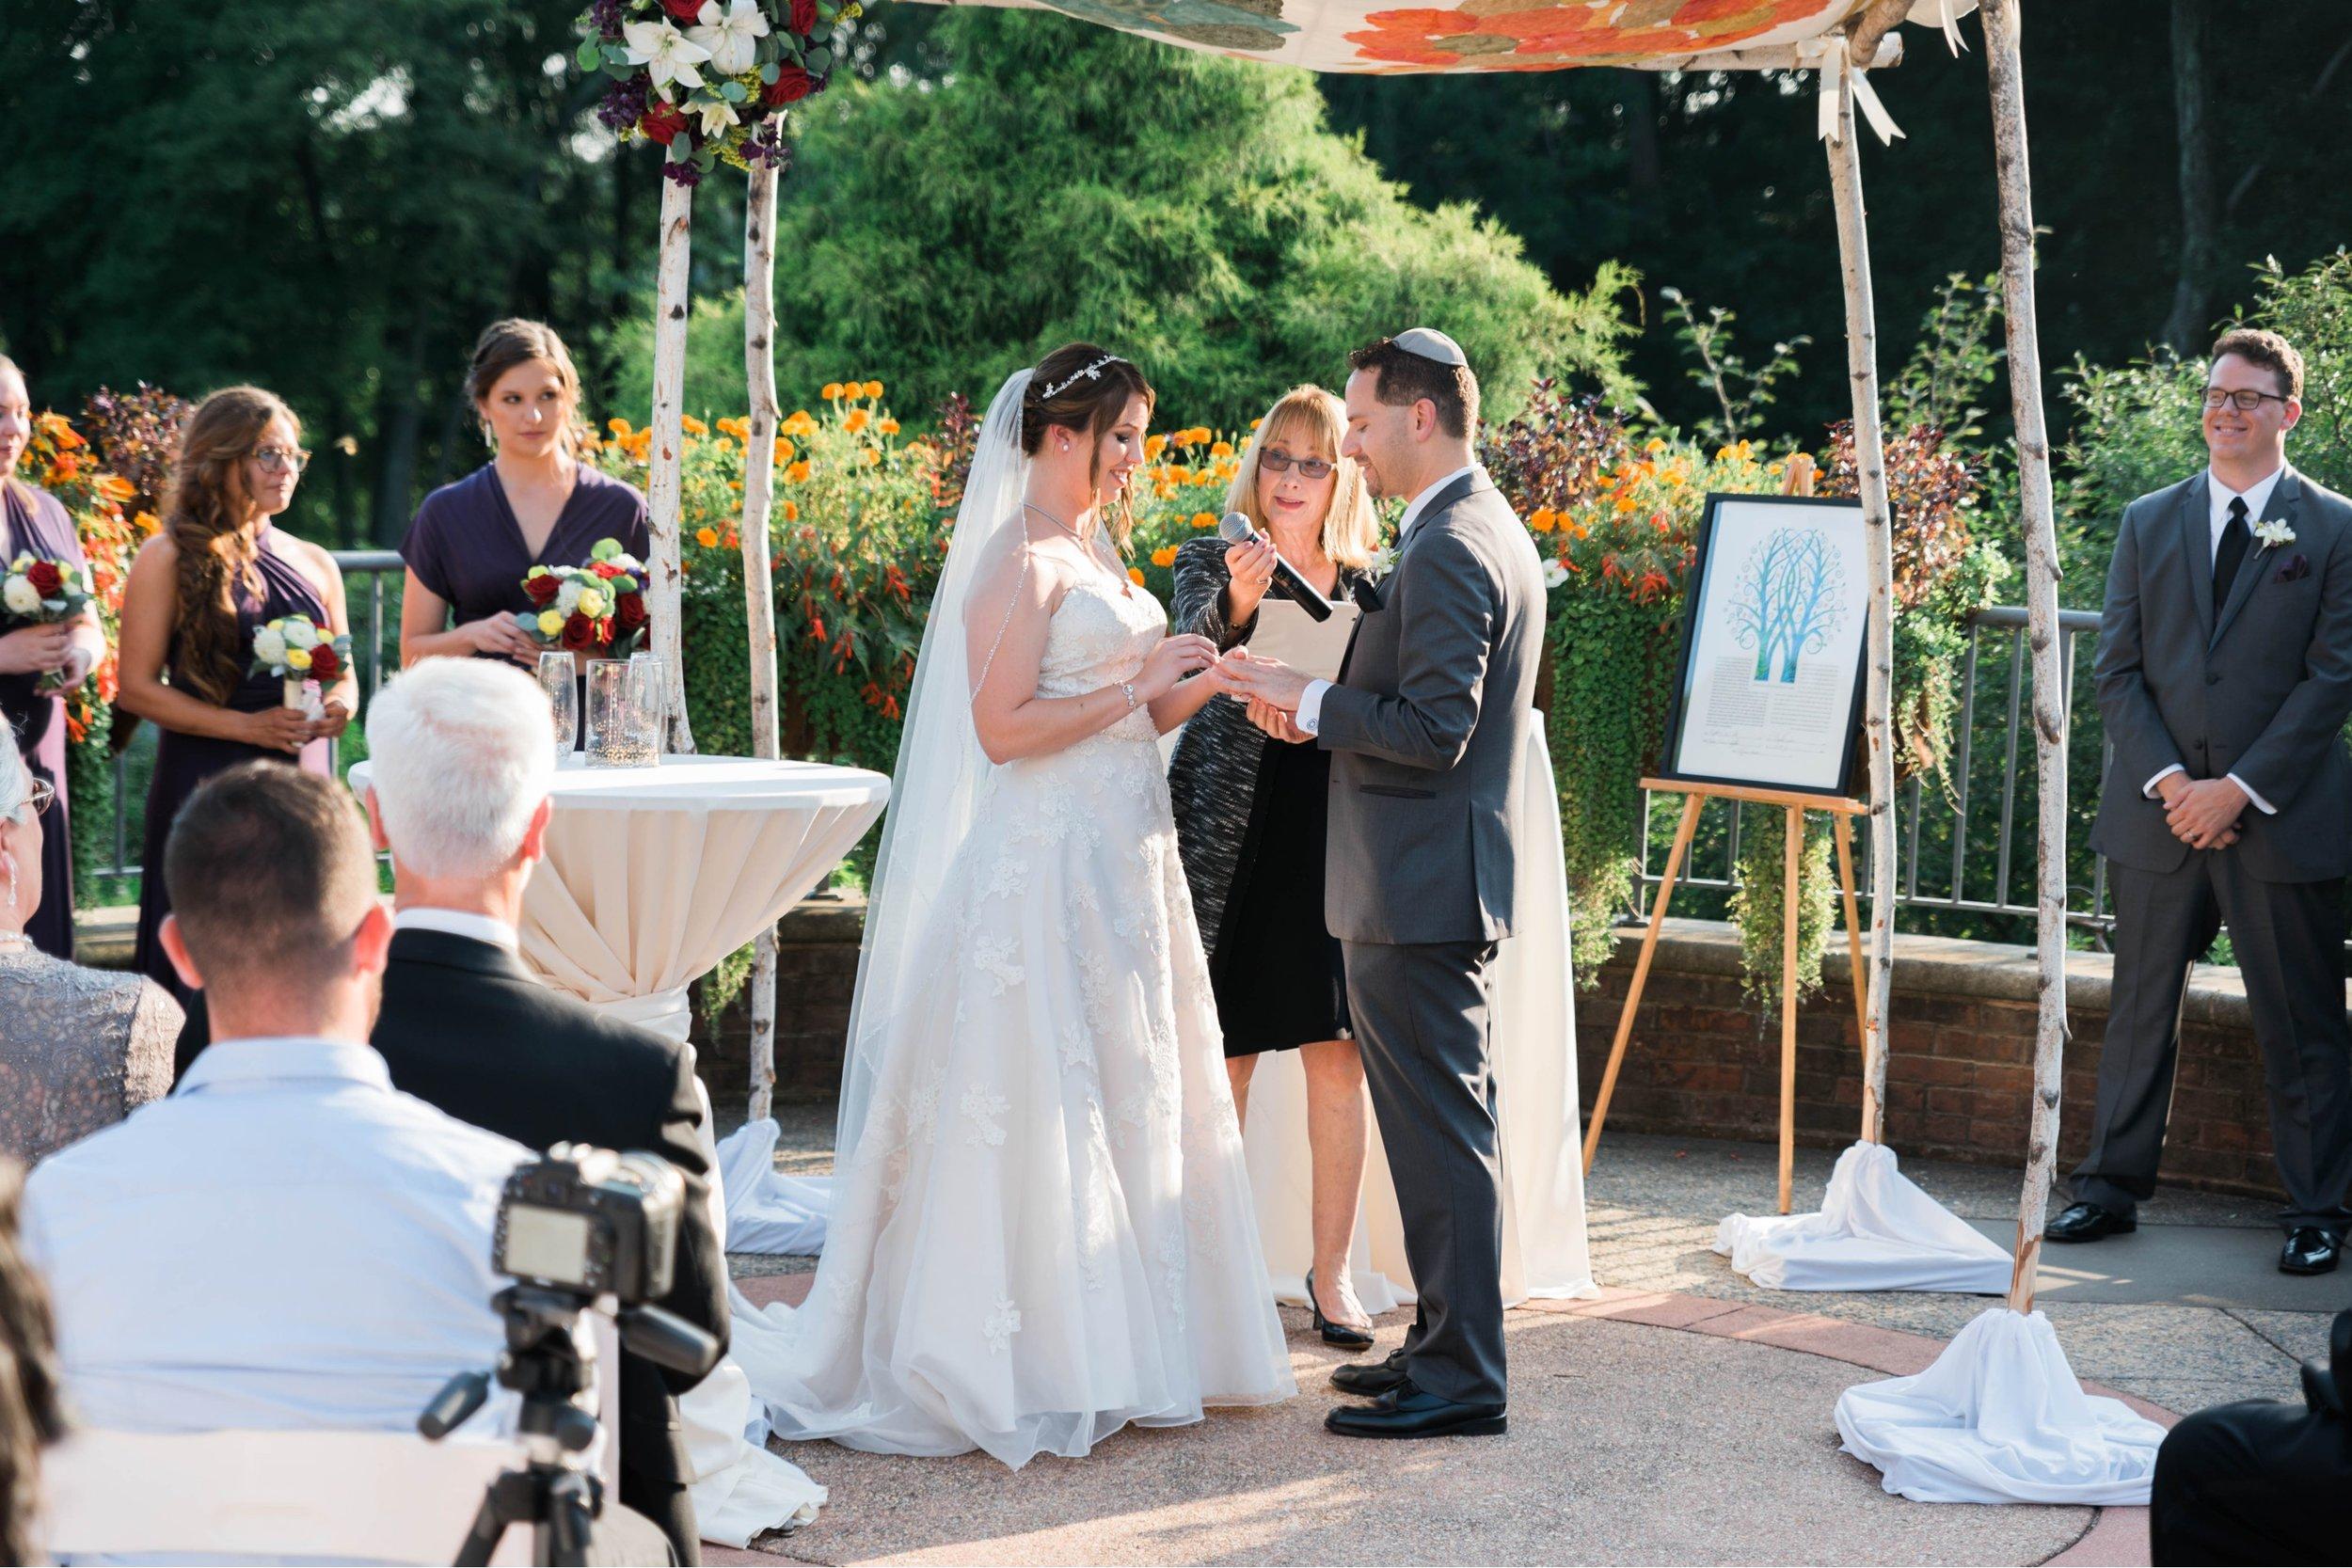 TheAtriumatMeadowlark_Virginiawedding photographer_lynchburgweddingphotographer_DCweddingPhotographer_KristinAaron 27.jpg